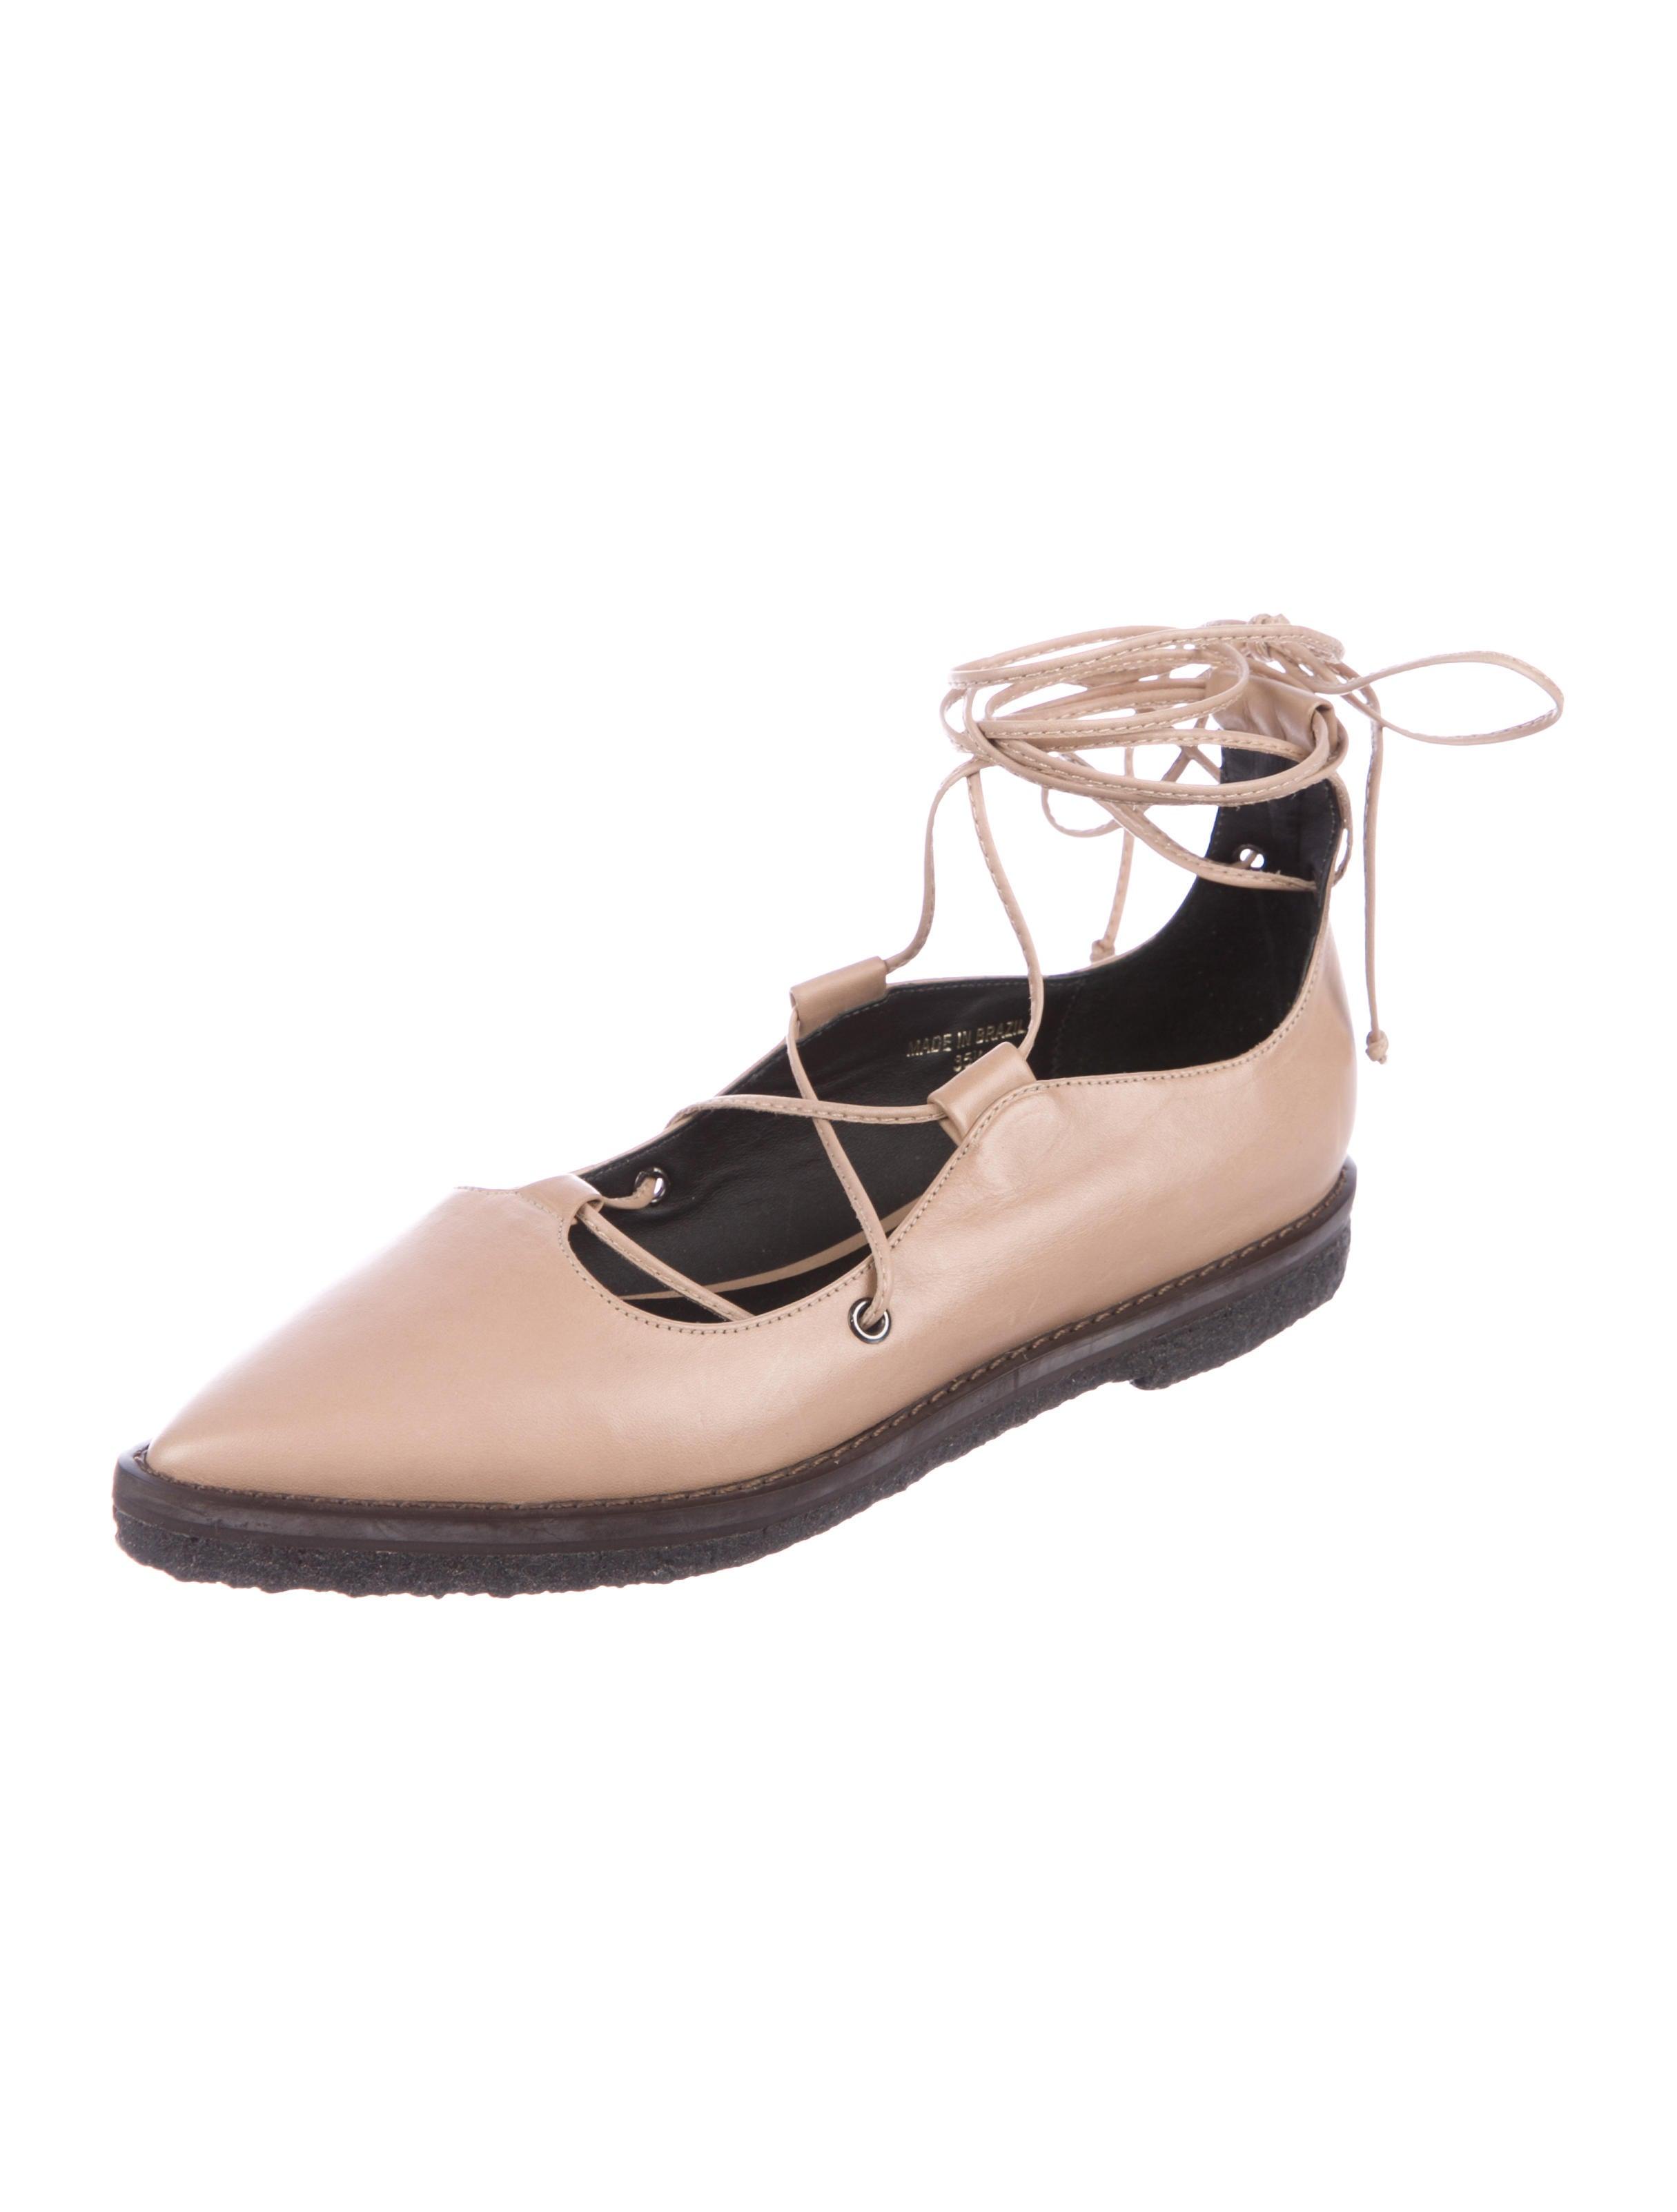 Tibi Leather Wrap-Around Flats discount big sale l1zm2p